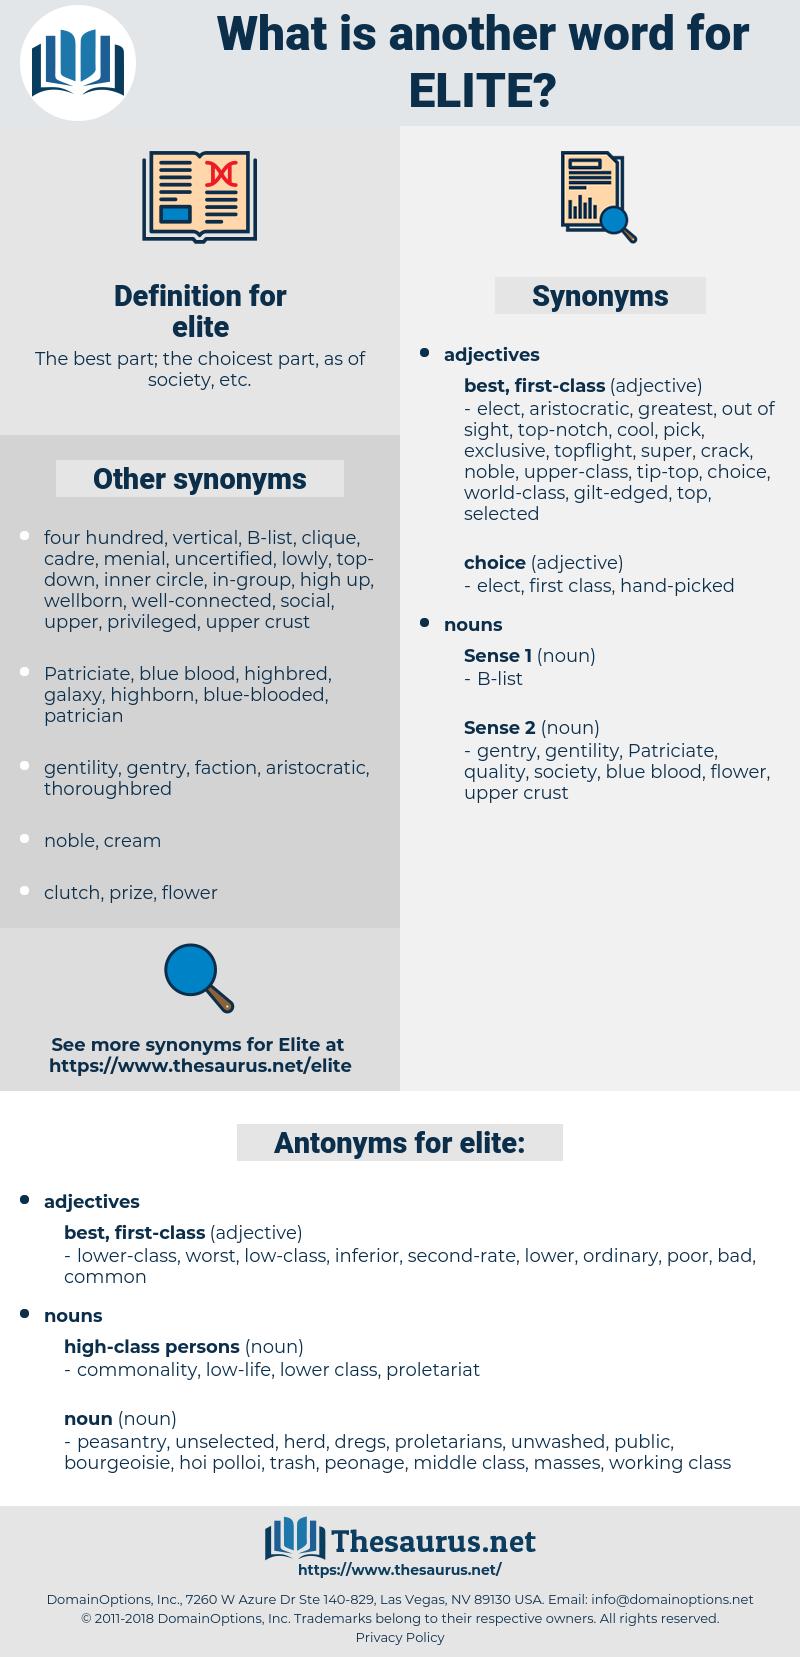 elite, synonym elite, another word for elite, words like elite, thesaurus elite